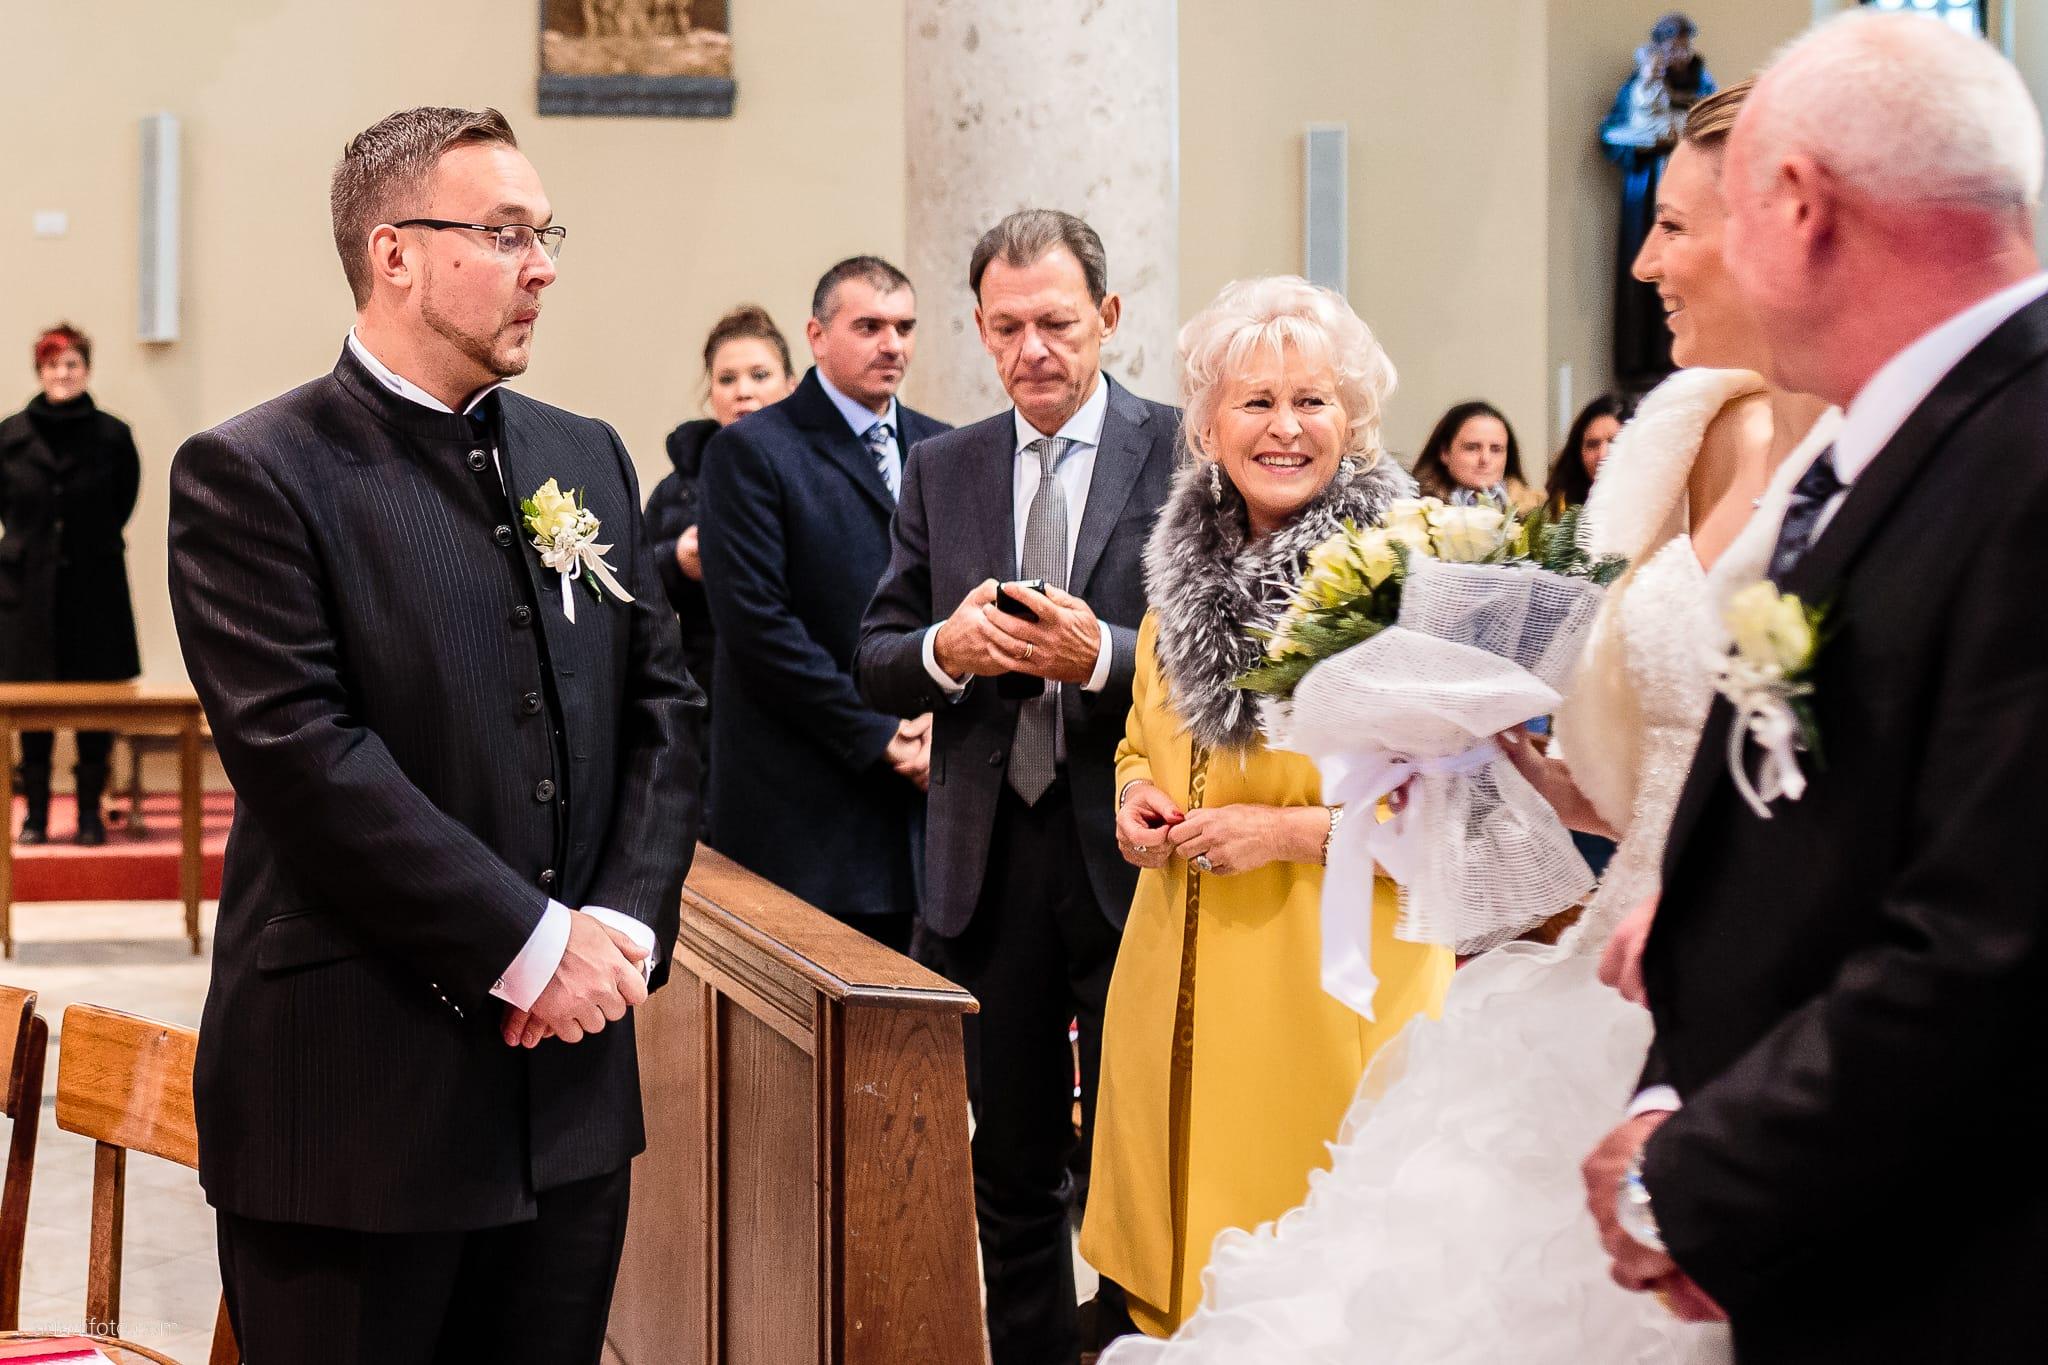 Elena Fabio Matrimonio Monfalcone Duomo di Sant'Ambrogio Castello Gorizia Rusjan Nova Gorica Slovenia cerimonia ingresso sposa